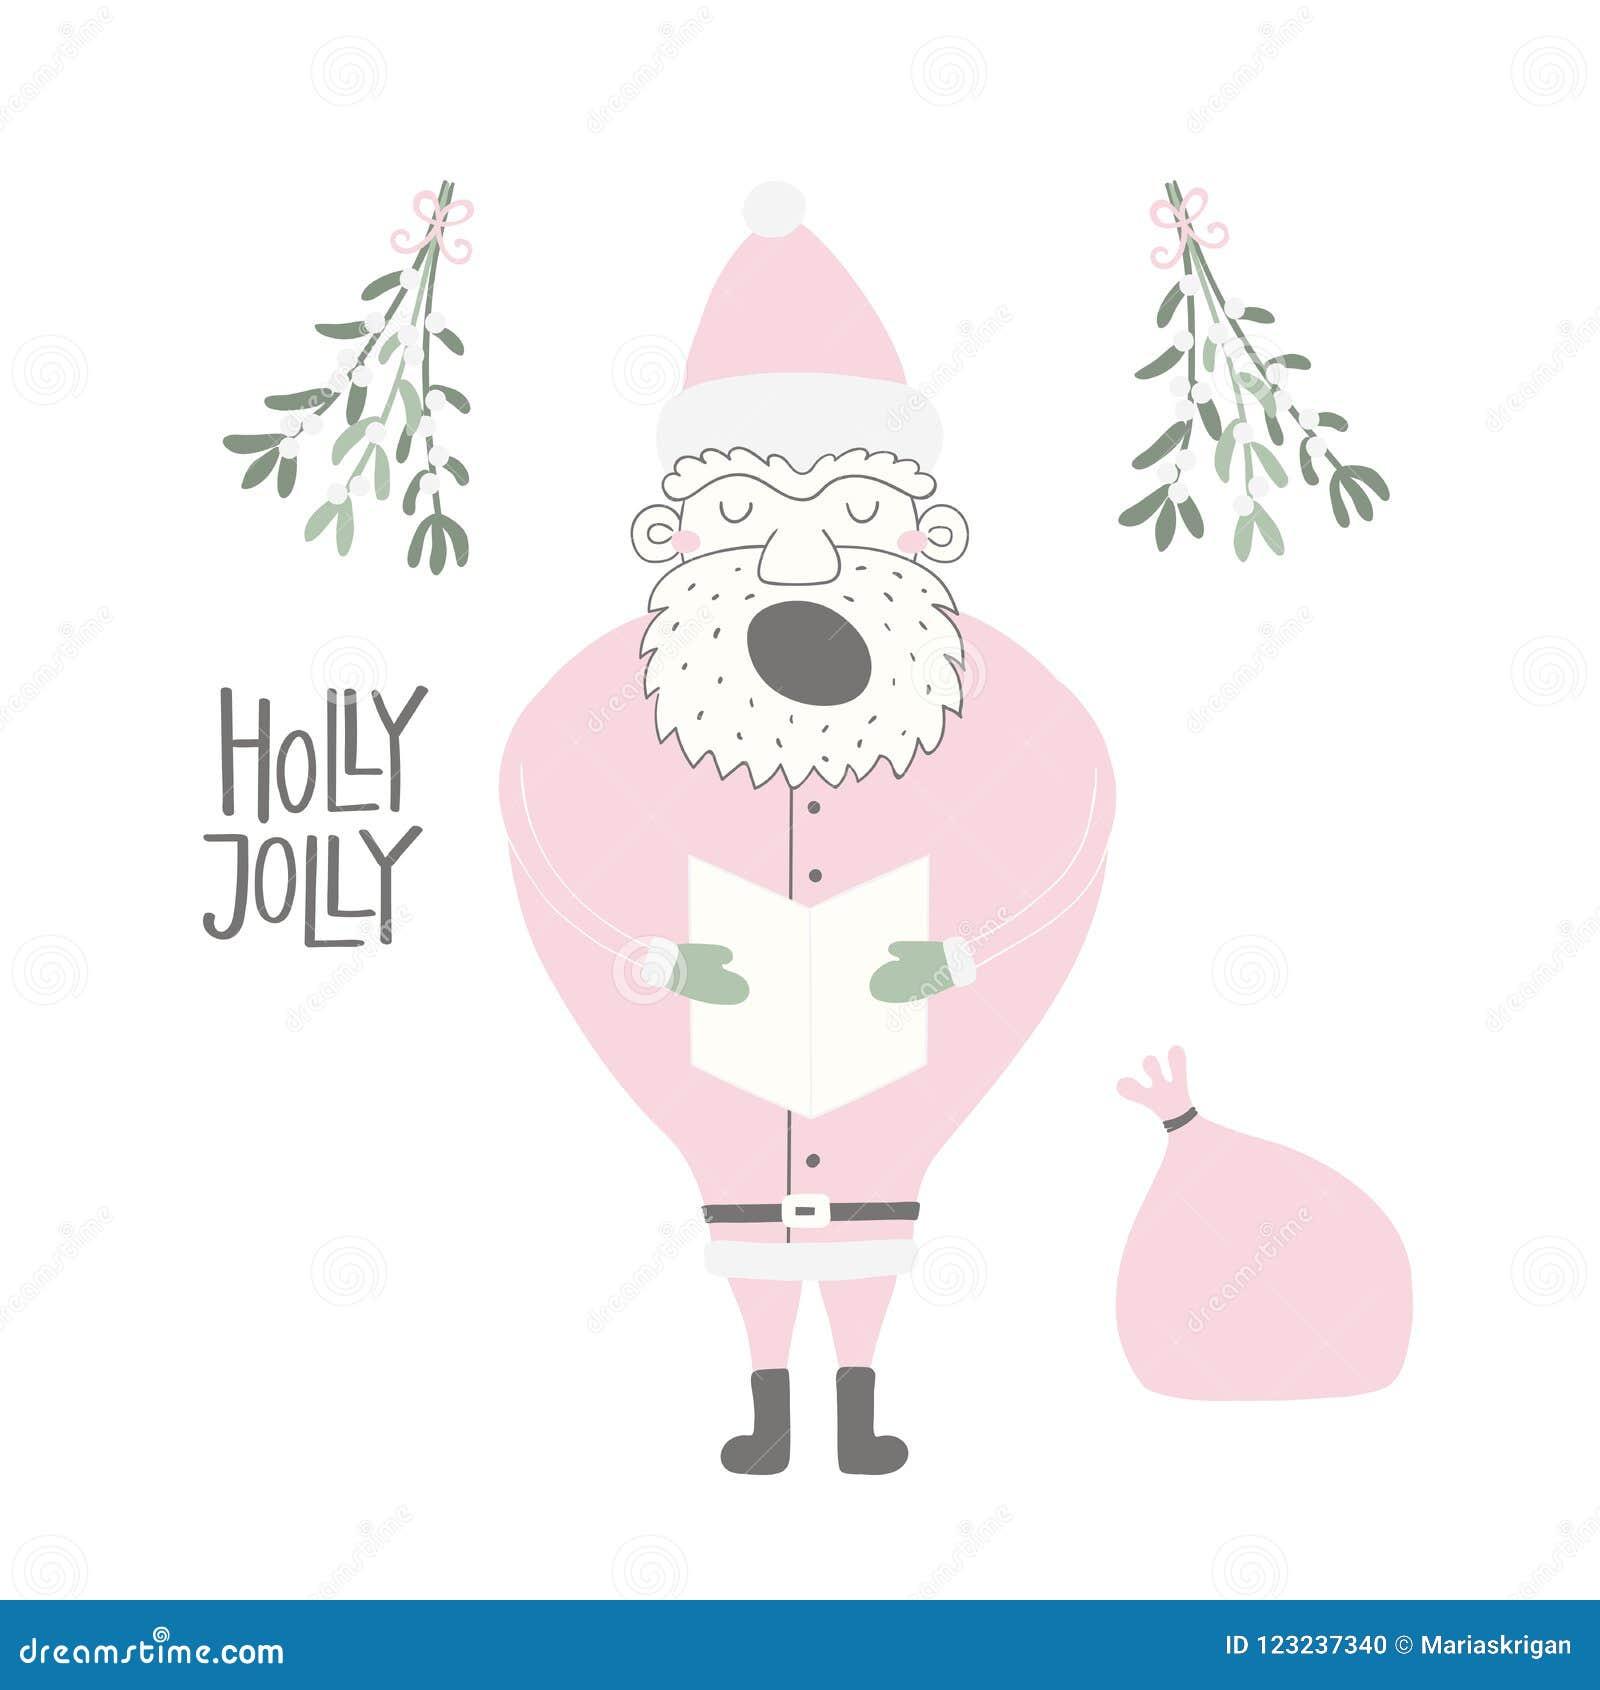 Funny Santa Claus Christmas Card Stock Vector - Illustration of face ...